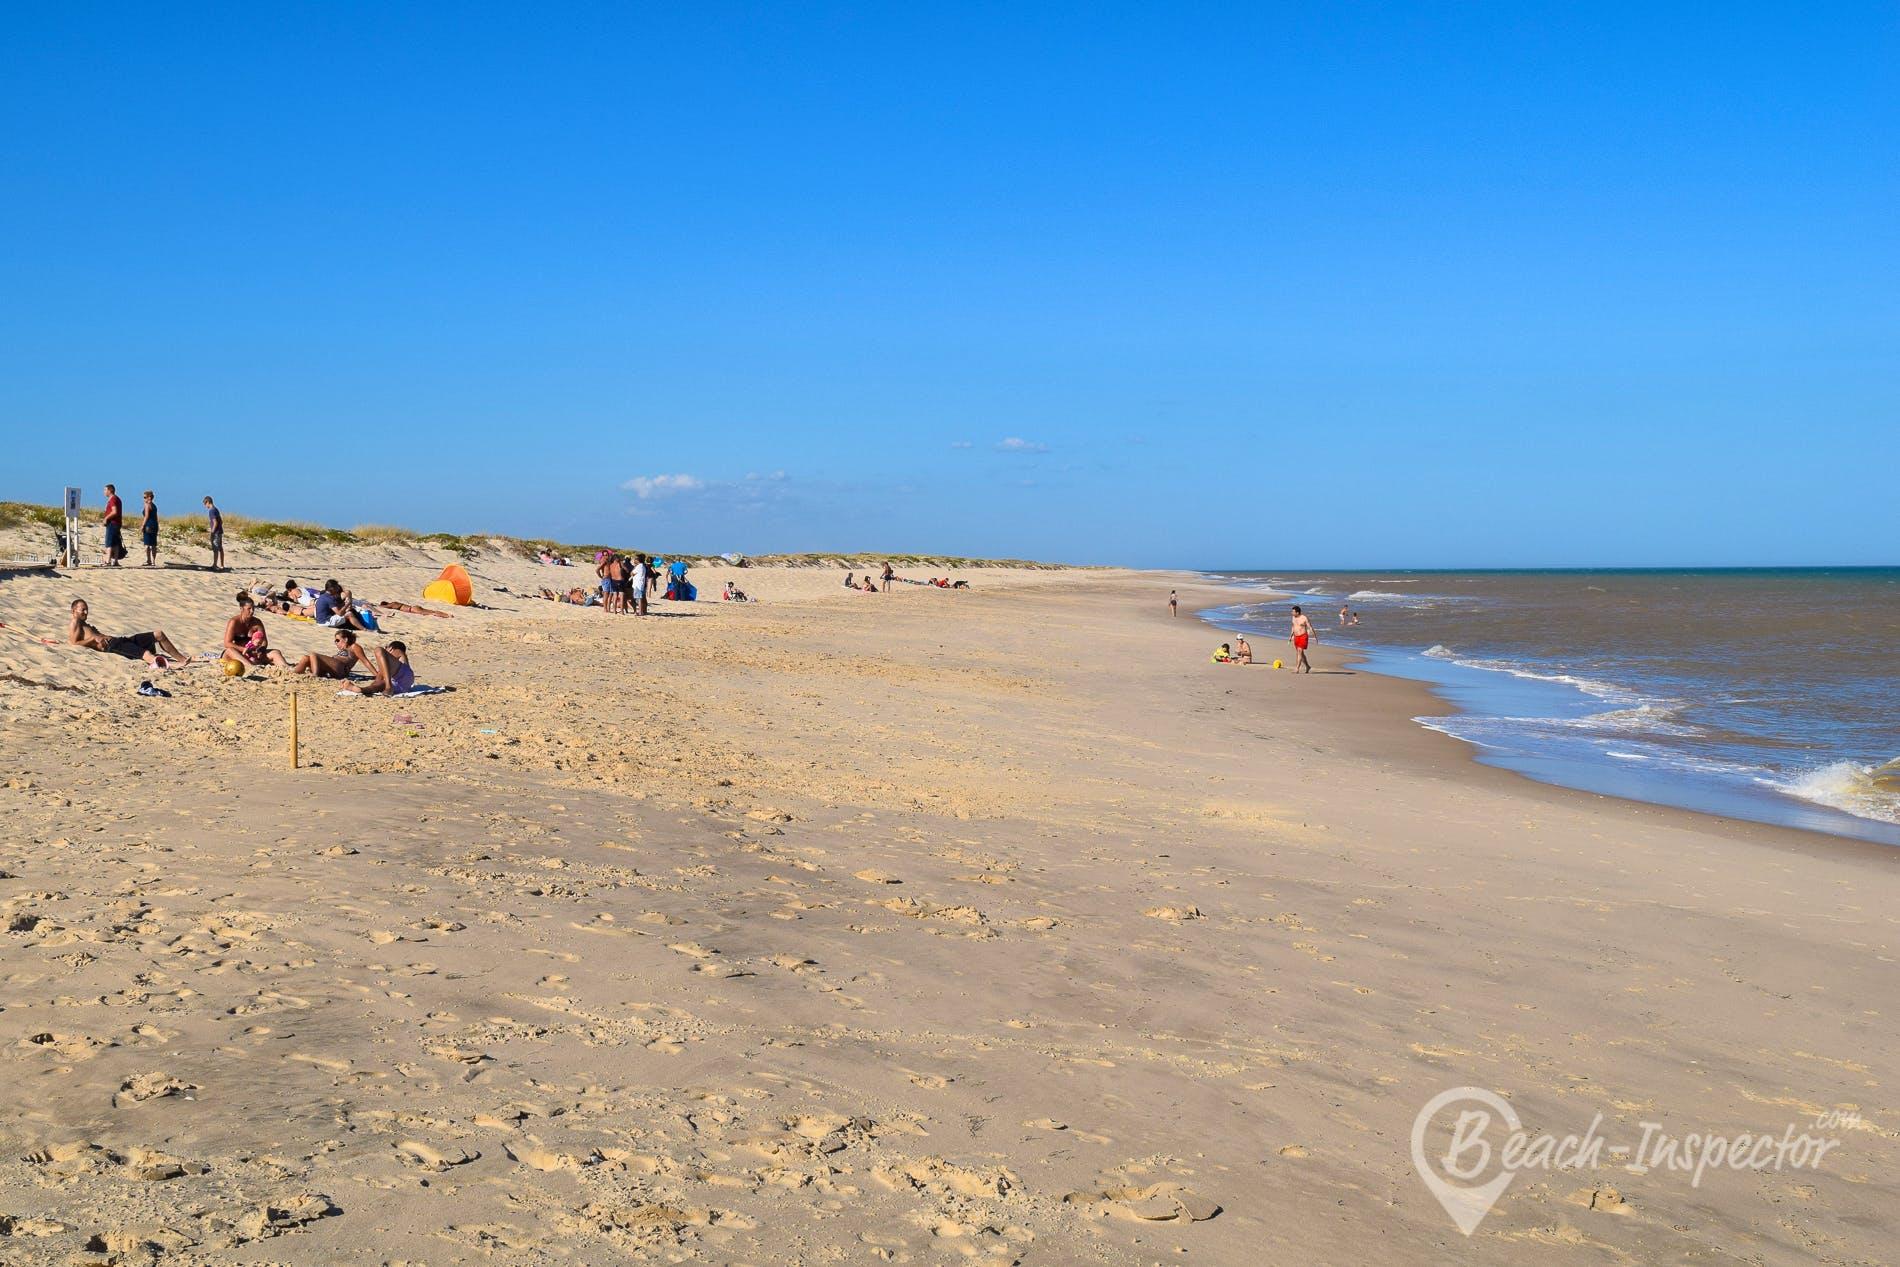 Strand Praia dos Hangares, Algarve, Portugal